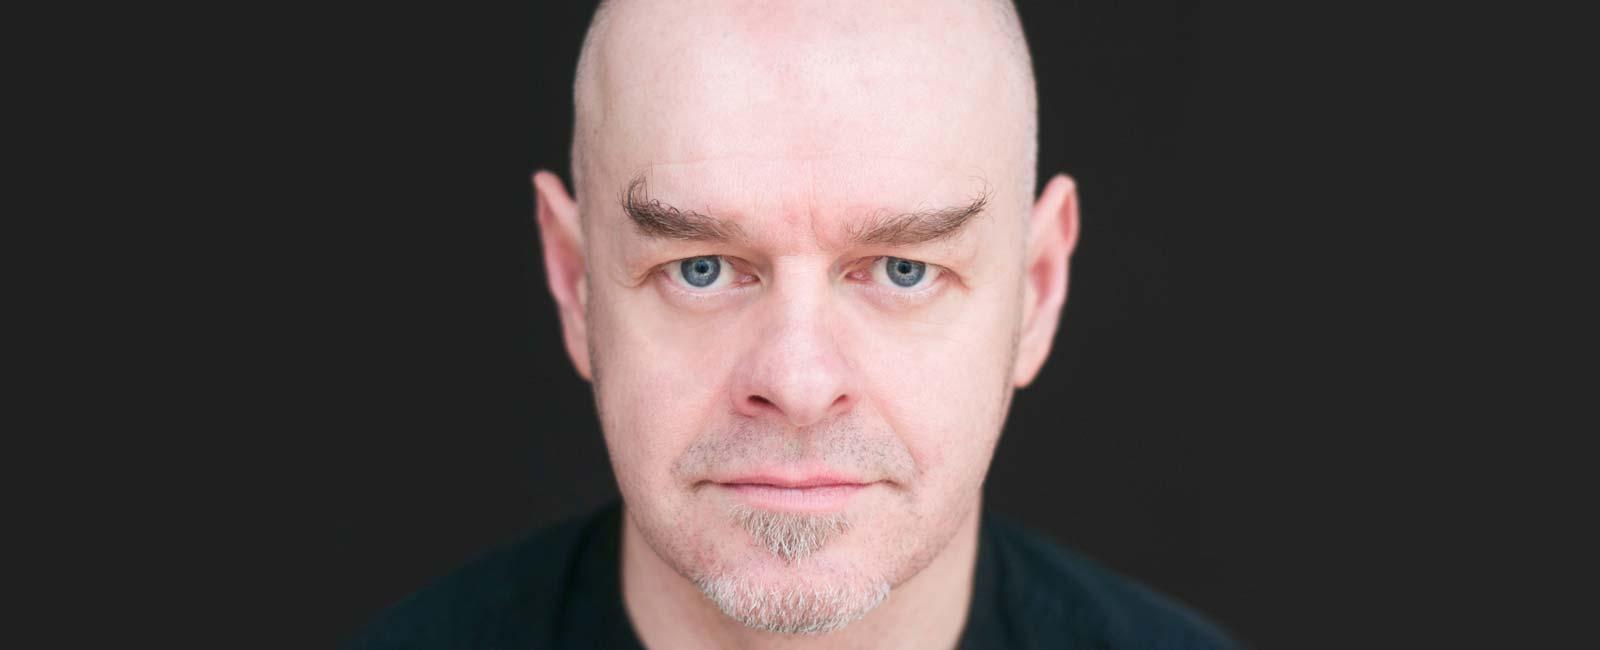 Paul Thorne UK Comedian Musician